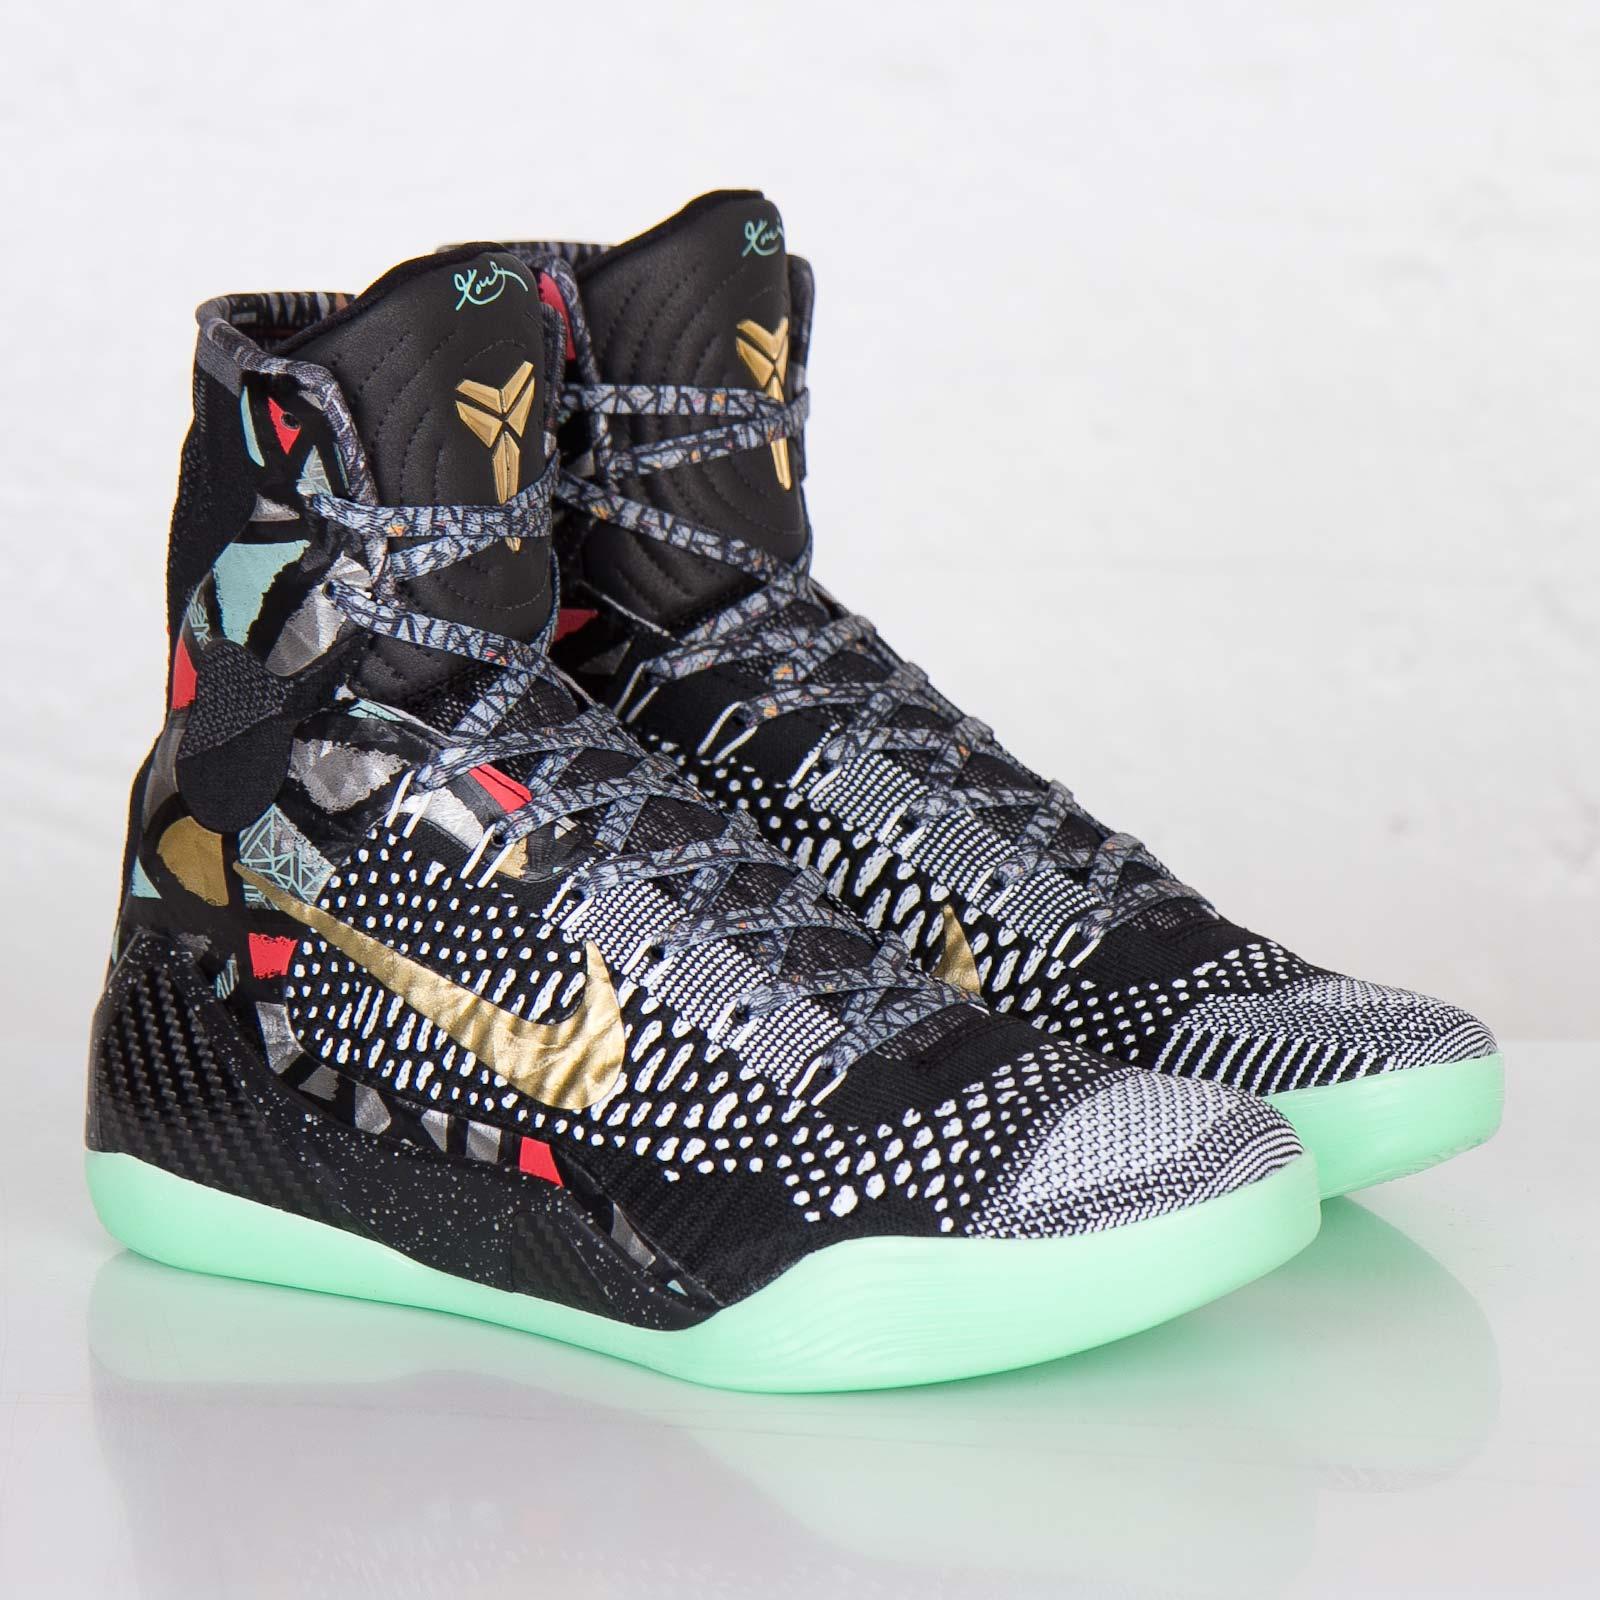 002 Nike Kobe Elite IX Sneakersnstuffsneakers 630847 wOPn0X8Nk